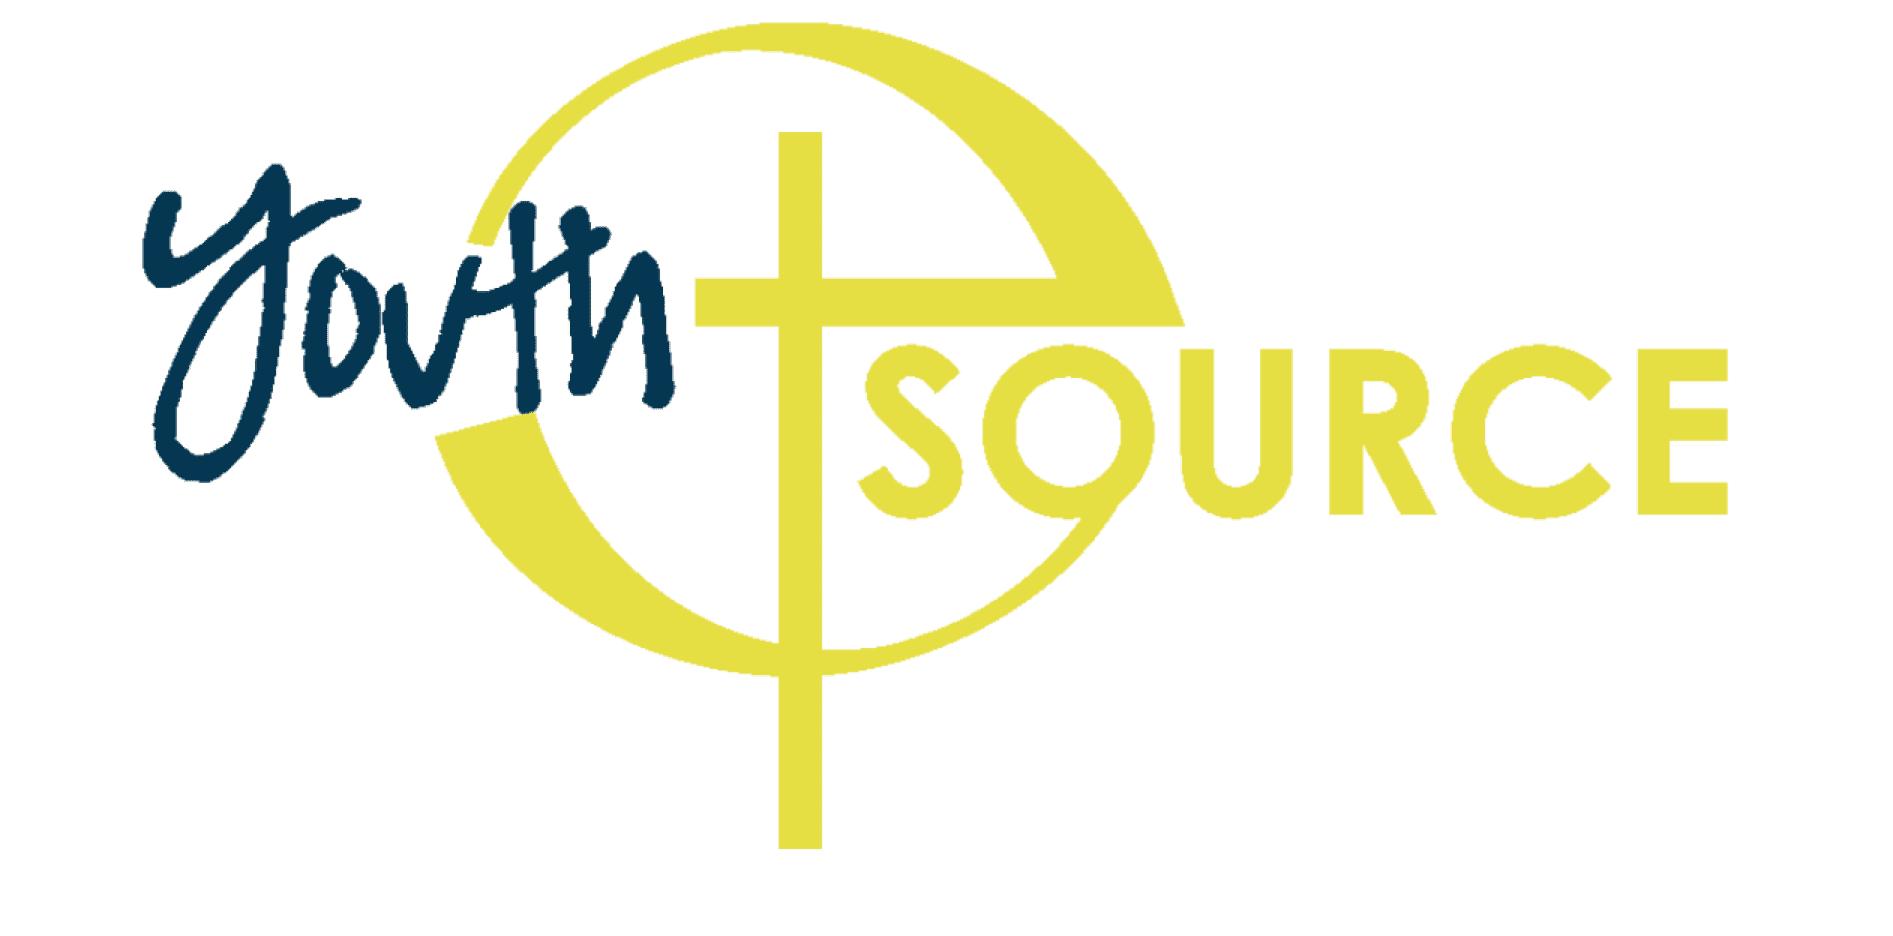 Youth Source logo